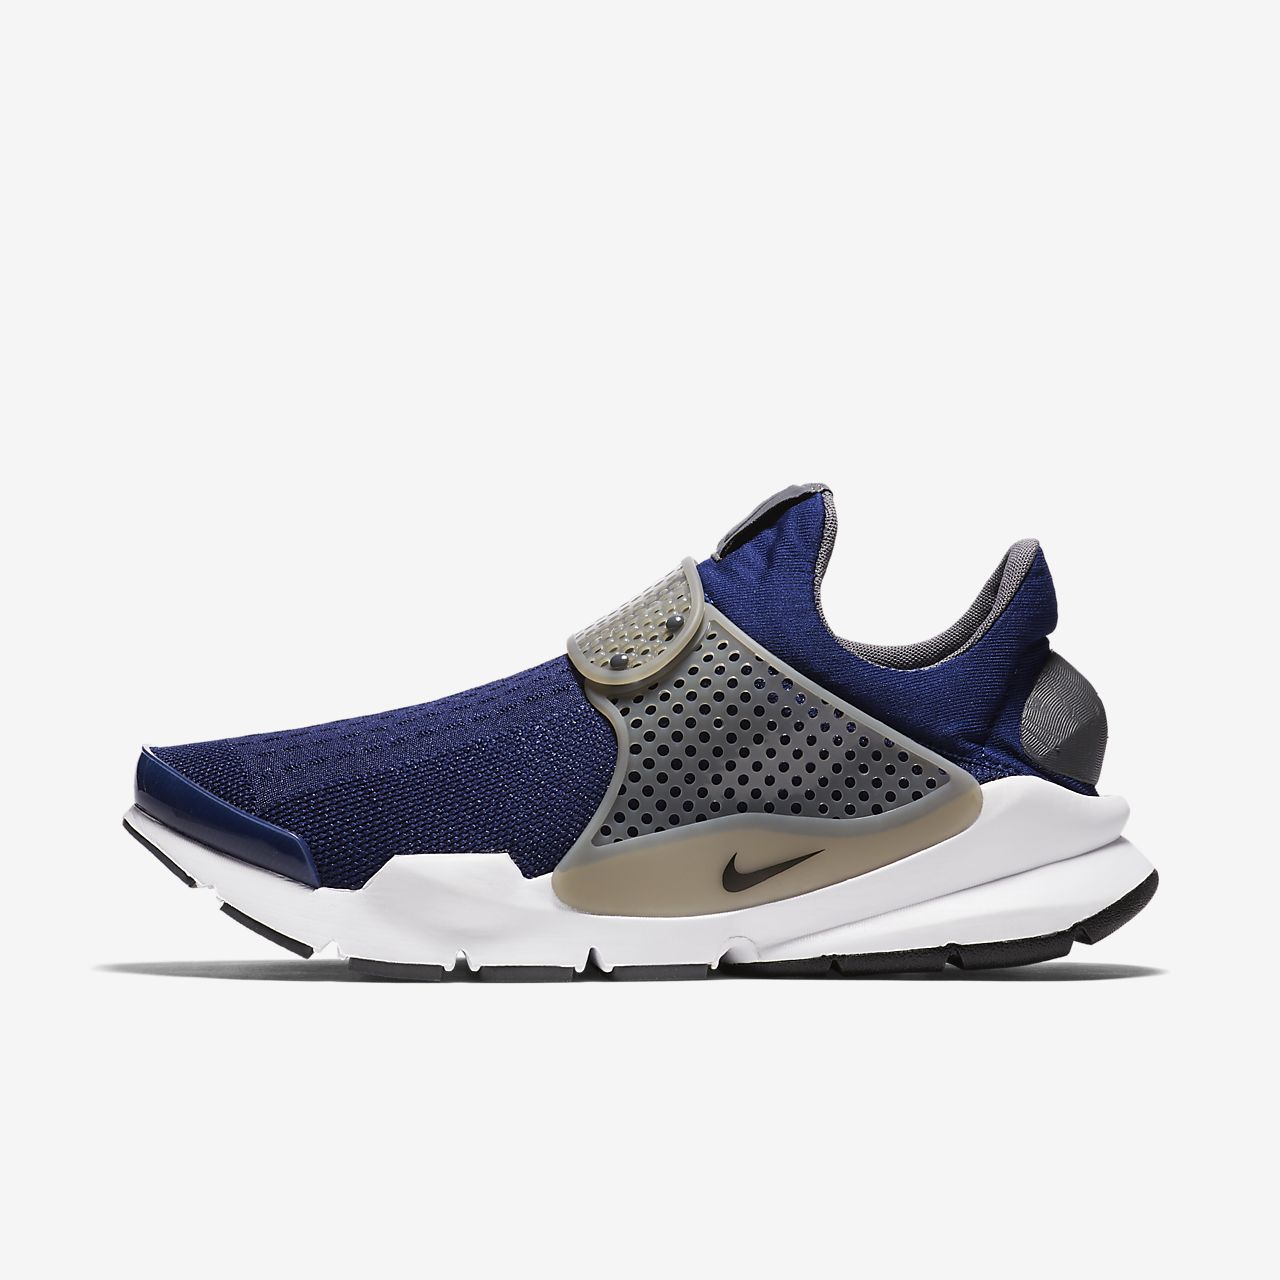 ... Nike Sock Dart Unisex Shoe